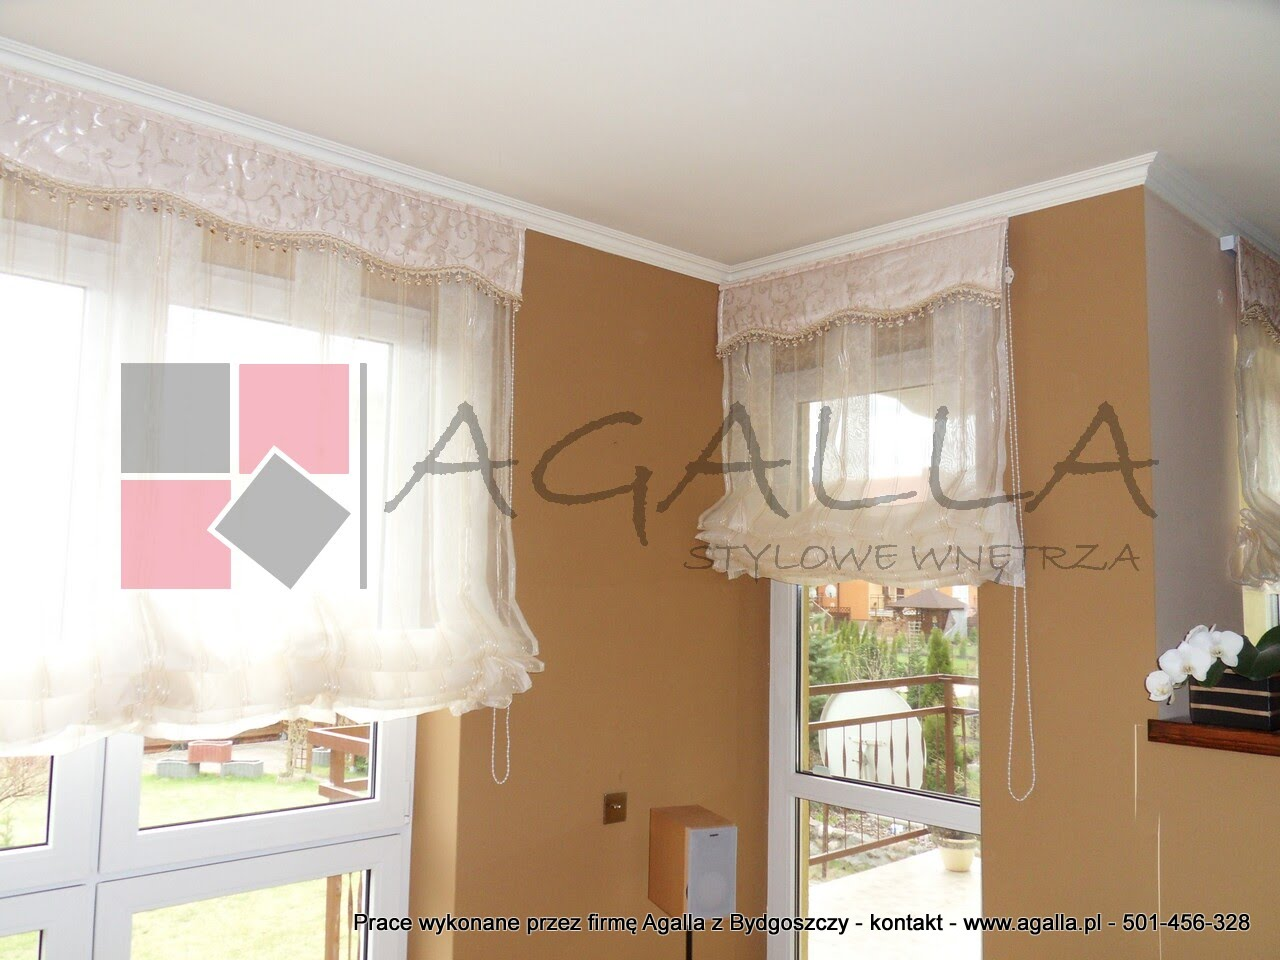 agalla04_1206